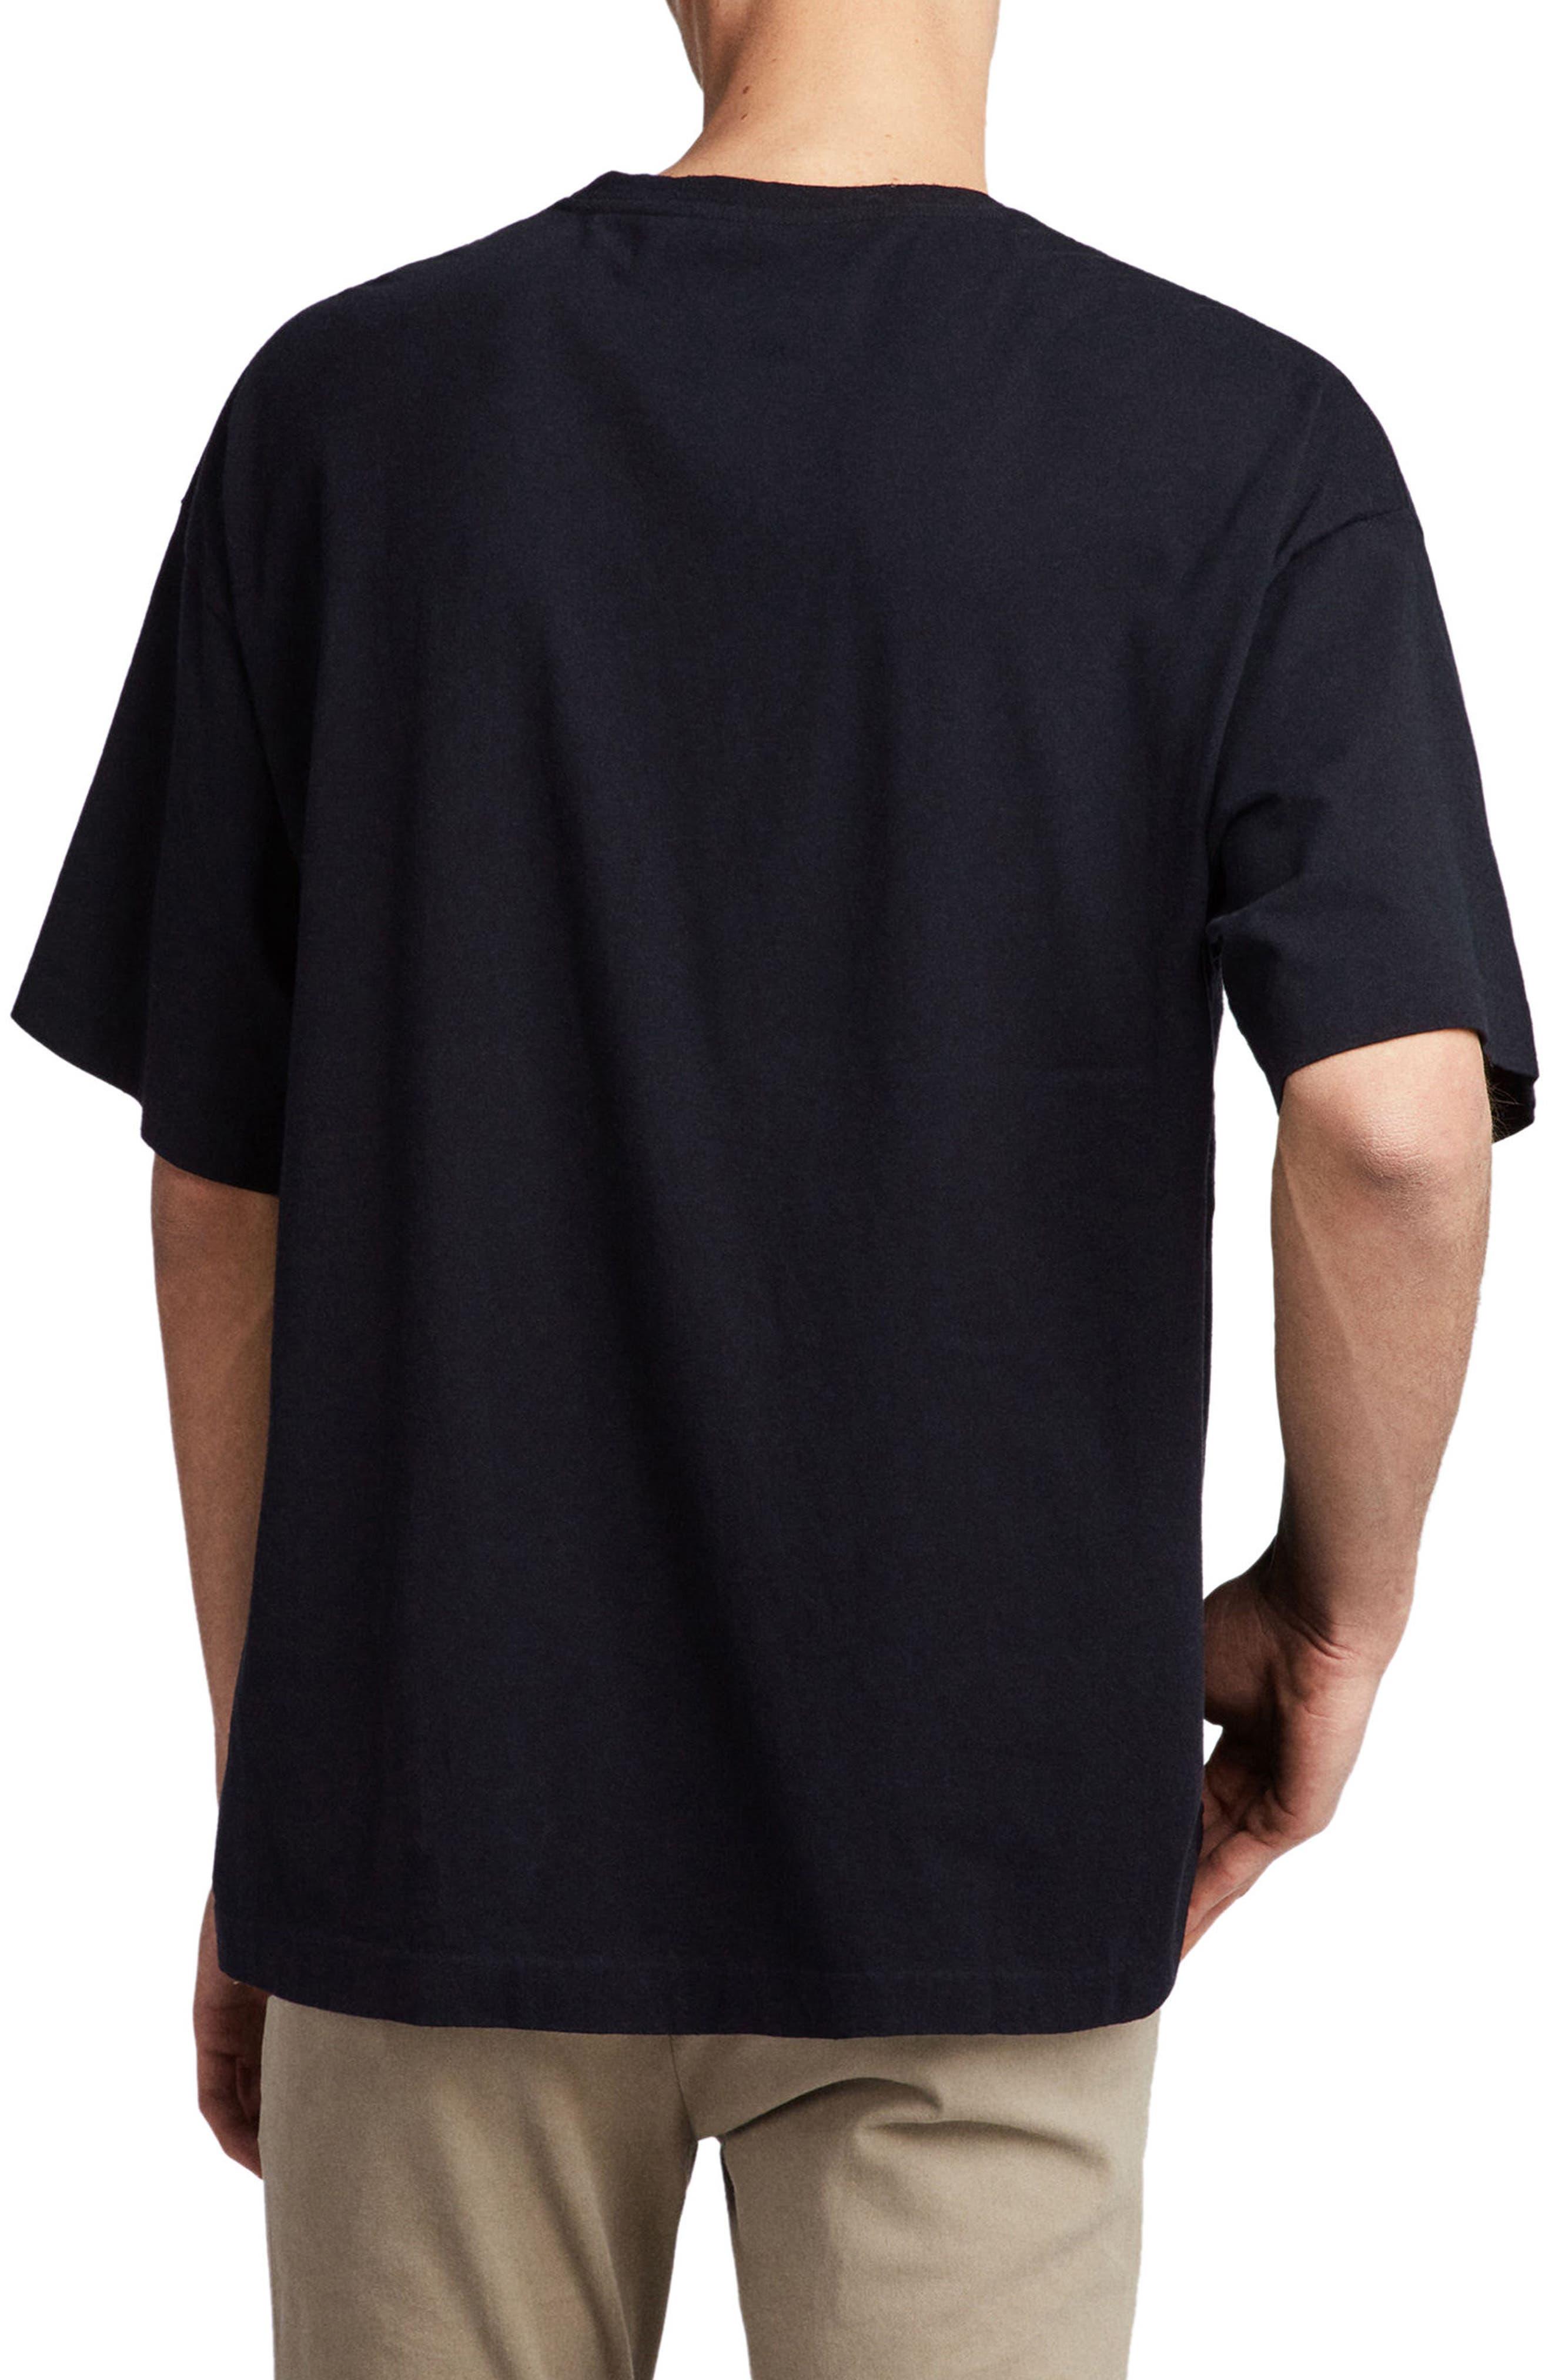 Atnom Crewneck T-Shirt,                             Alternate thumbnail 2, color,                             003